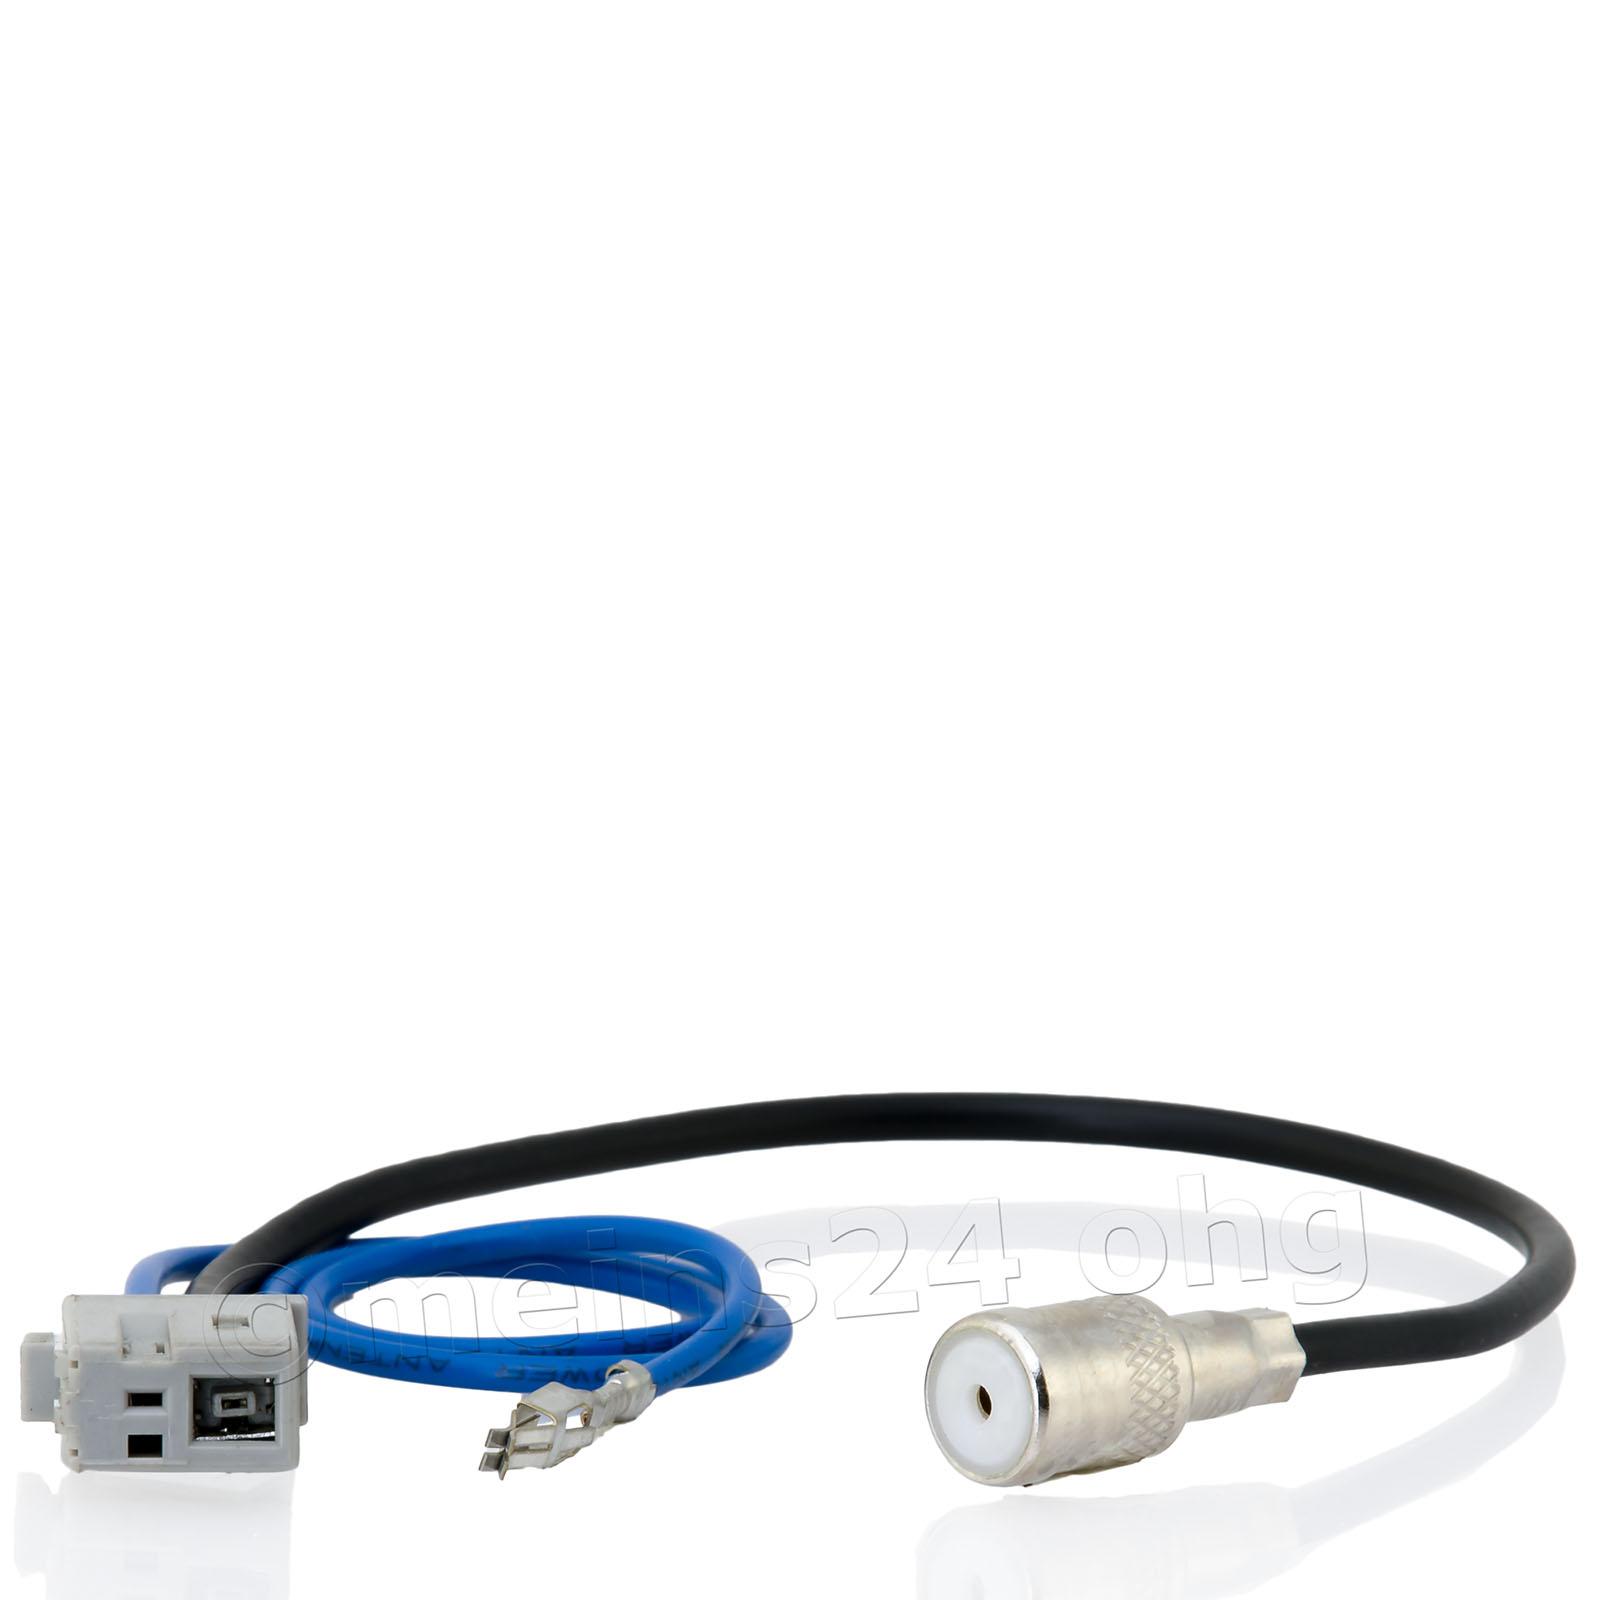 Antennenadapter HONDA MAZDA Buchse (f) -> ISO Buchse (f) 50 Ohm OEM